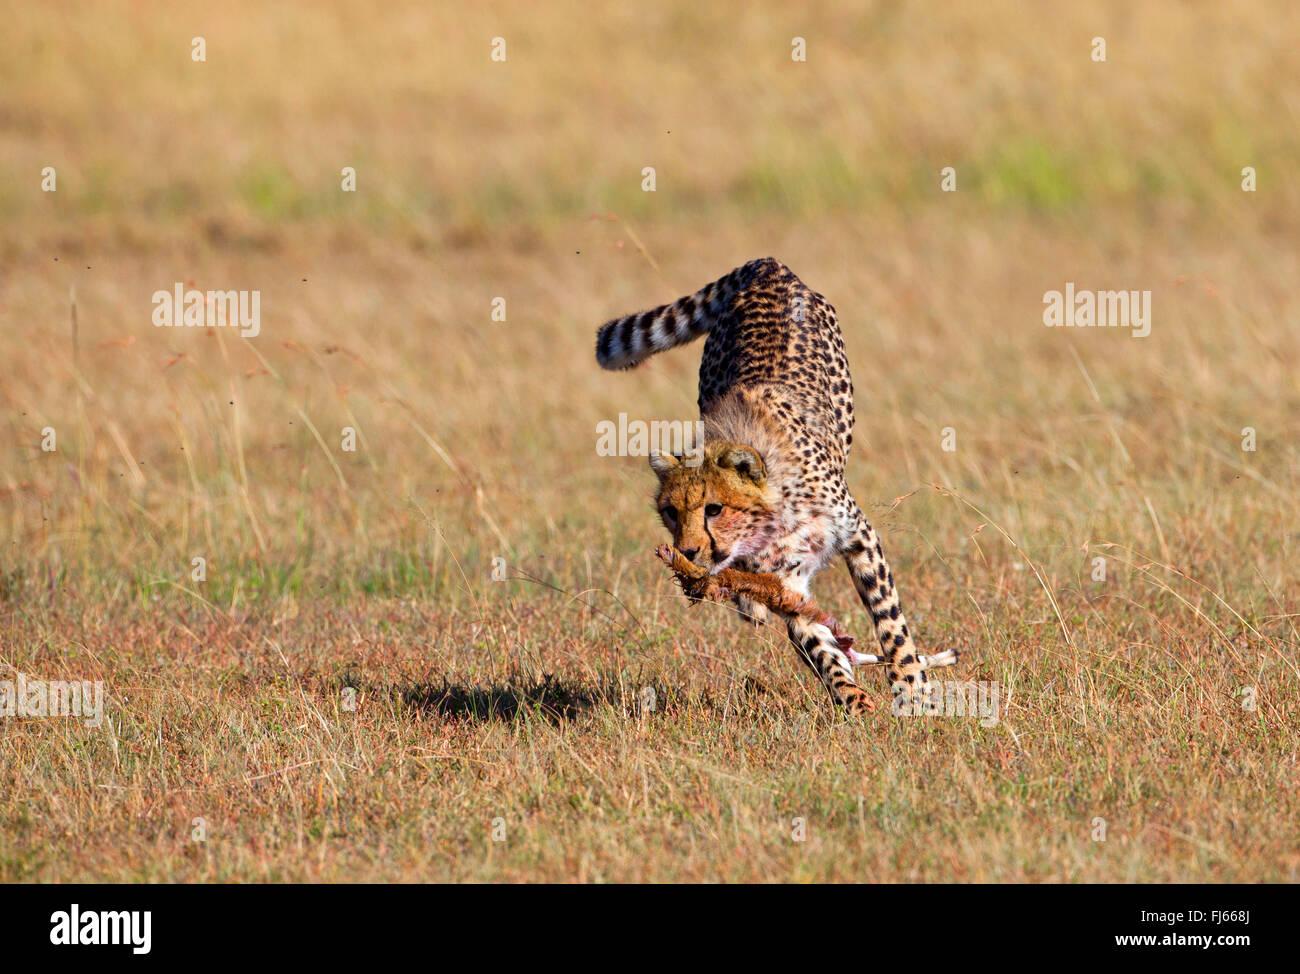 Gepard (Acinonyx Jubatus), flieht mit einem Kadaver im Maul, Kenia, Masai Mara Nationalpark Stockbild